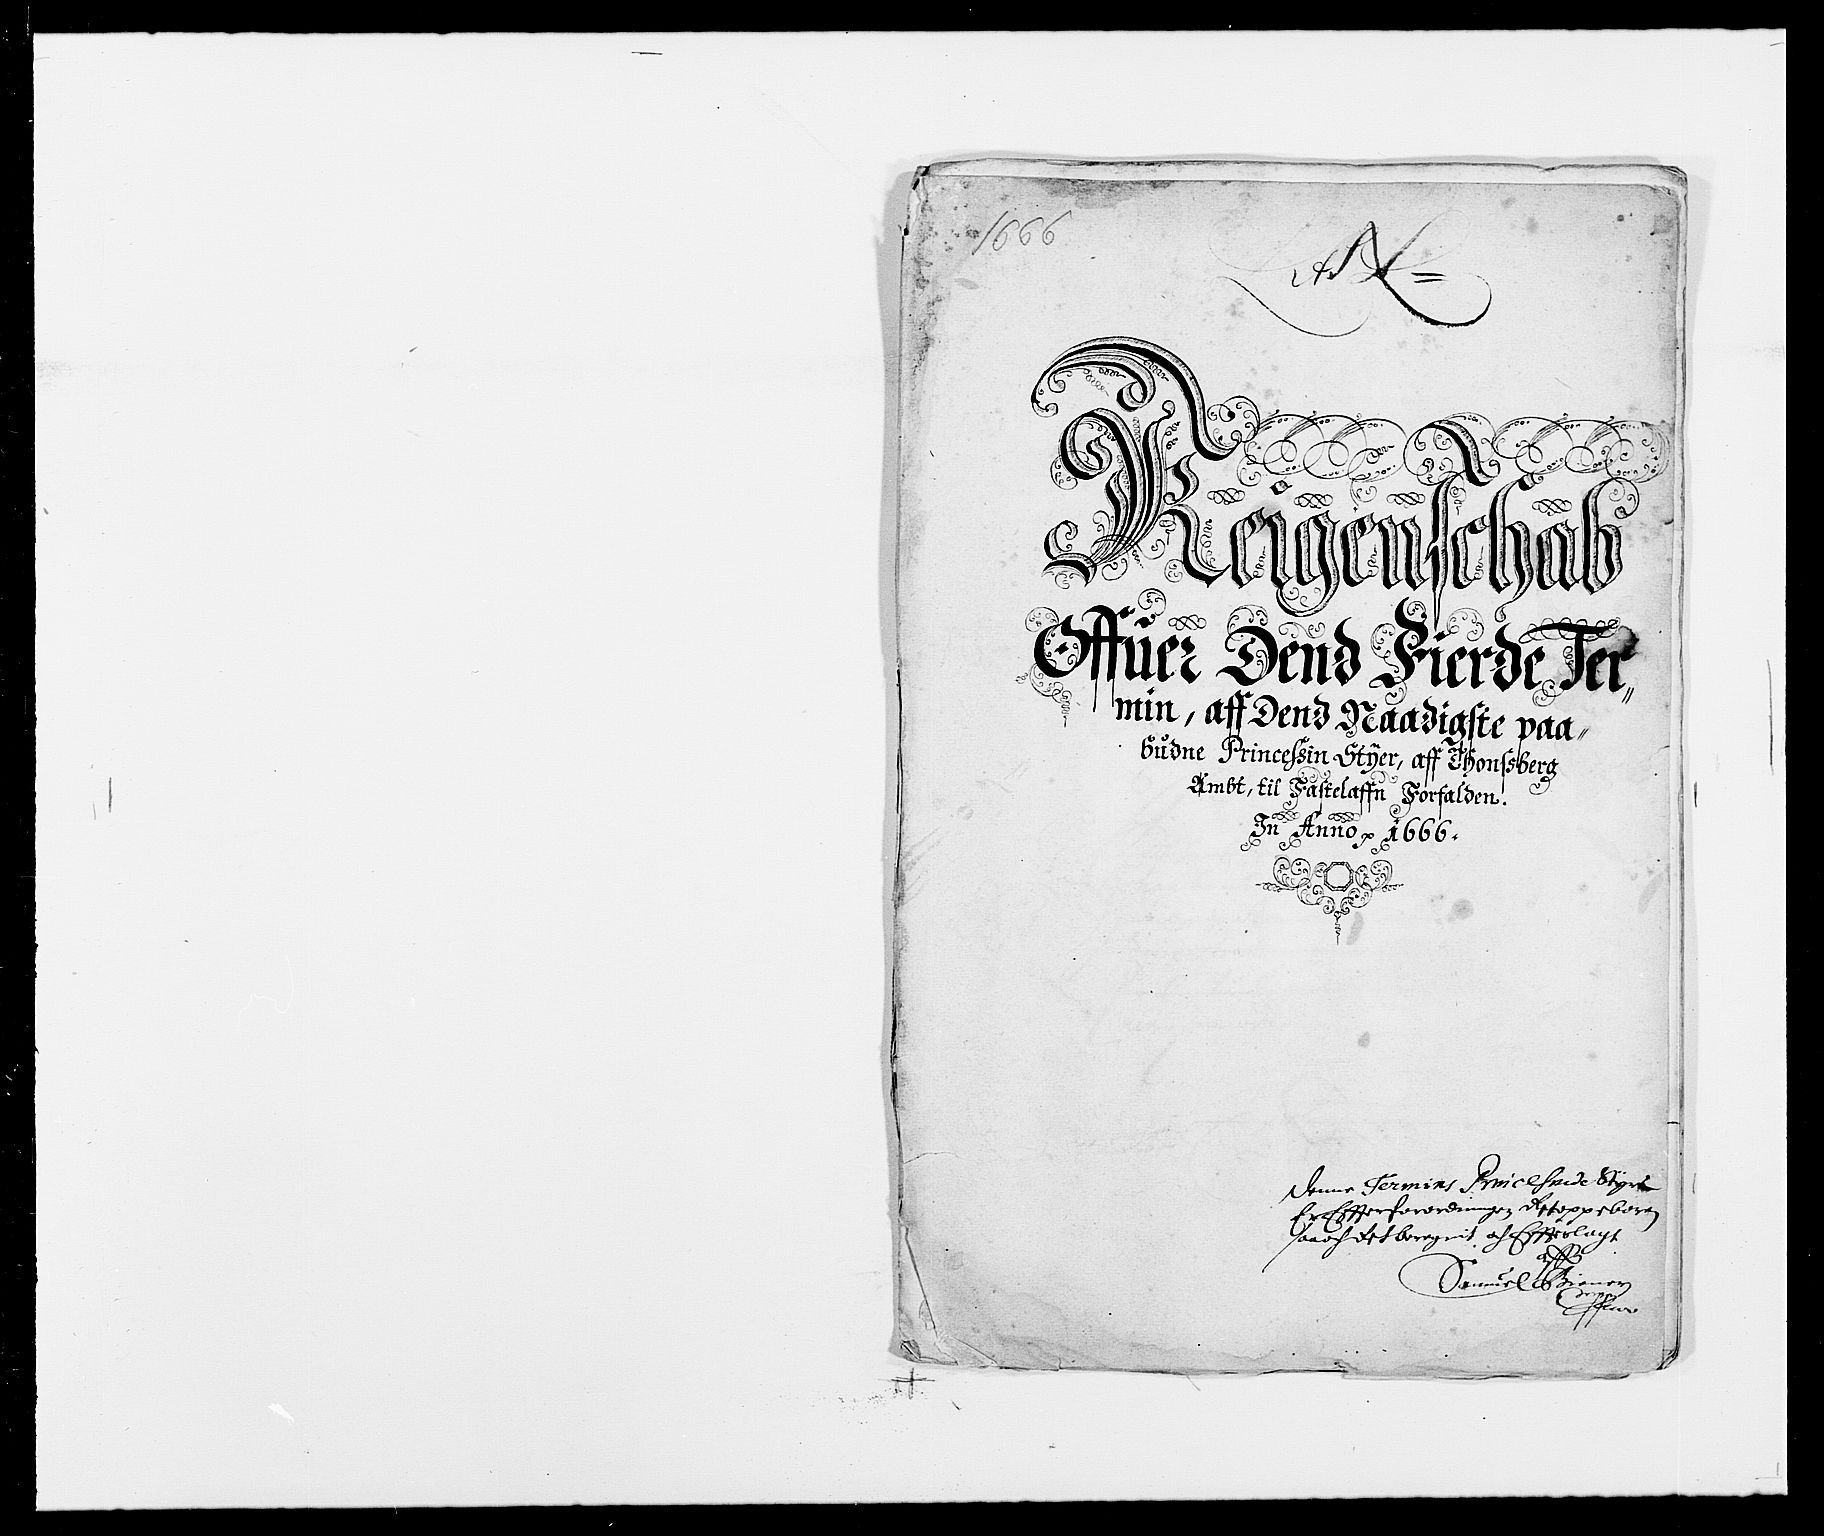 RA, Rentekammeret inntil 1814, Reviderte regnskaper, Fogderegnskap, R32/L1840: Fogderegnskap Jarlsberg grevskap, 1664-1673, s. 55